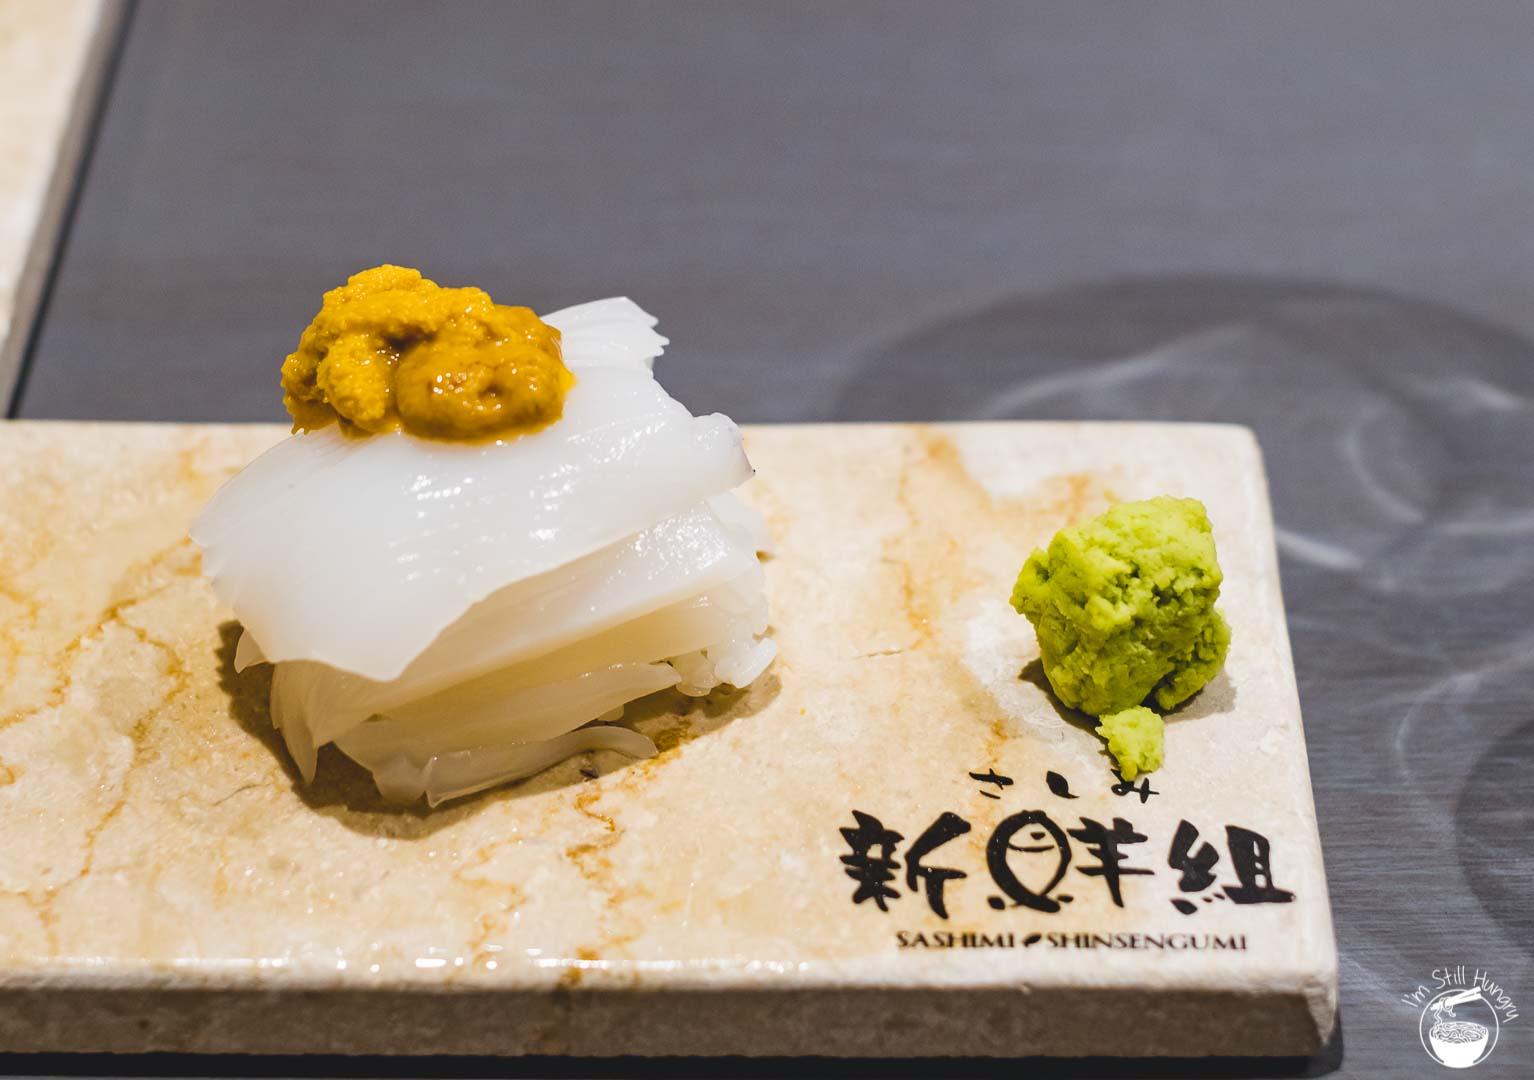 Sashimi Shinsengumi Crows Nest Sushi Omakase Squid w/sea urchin on top